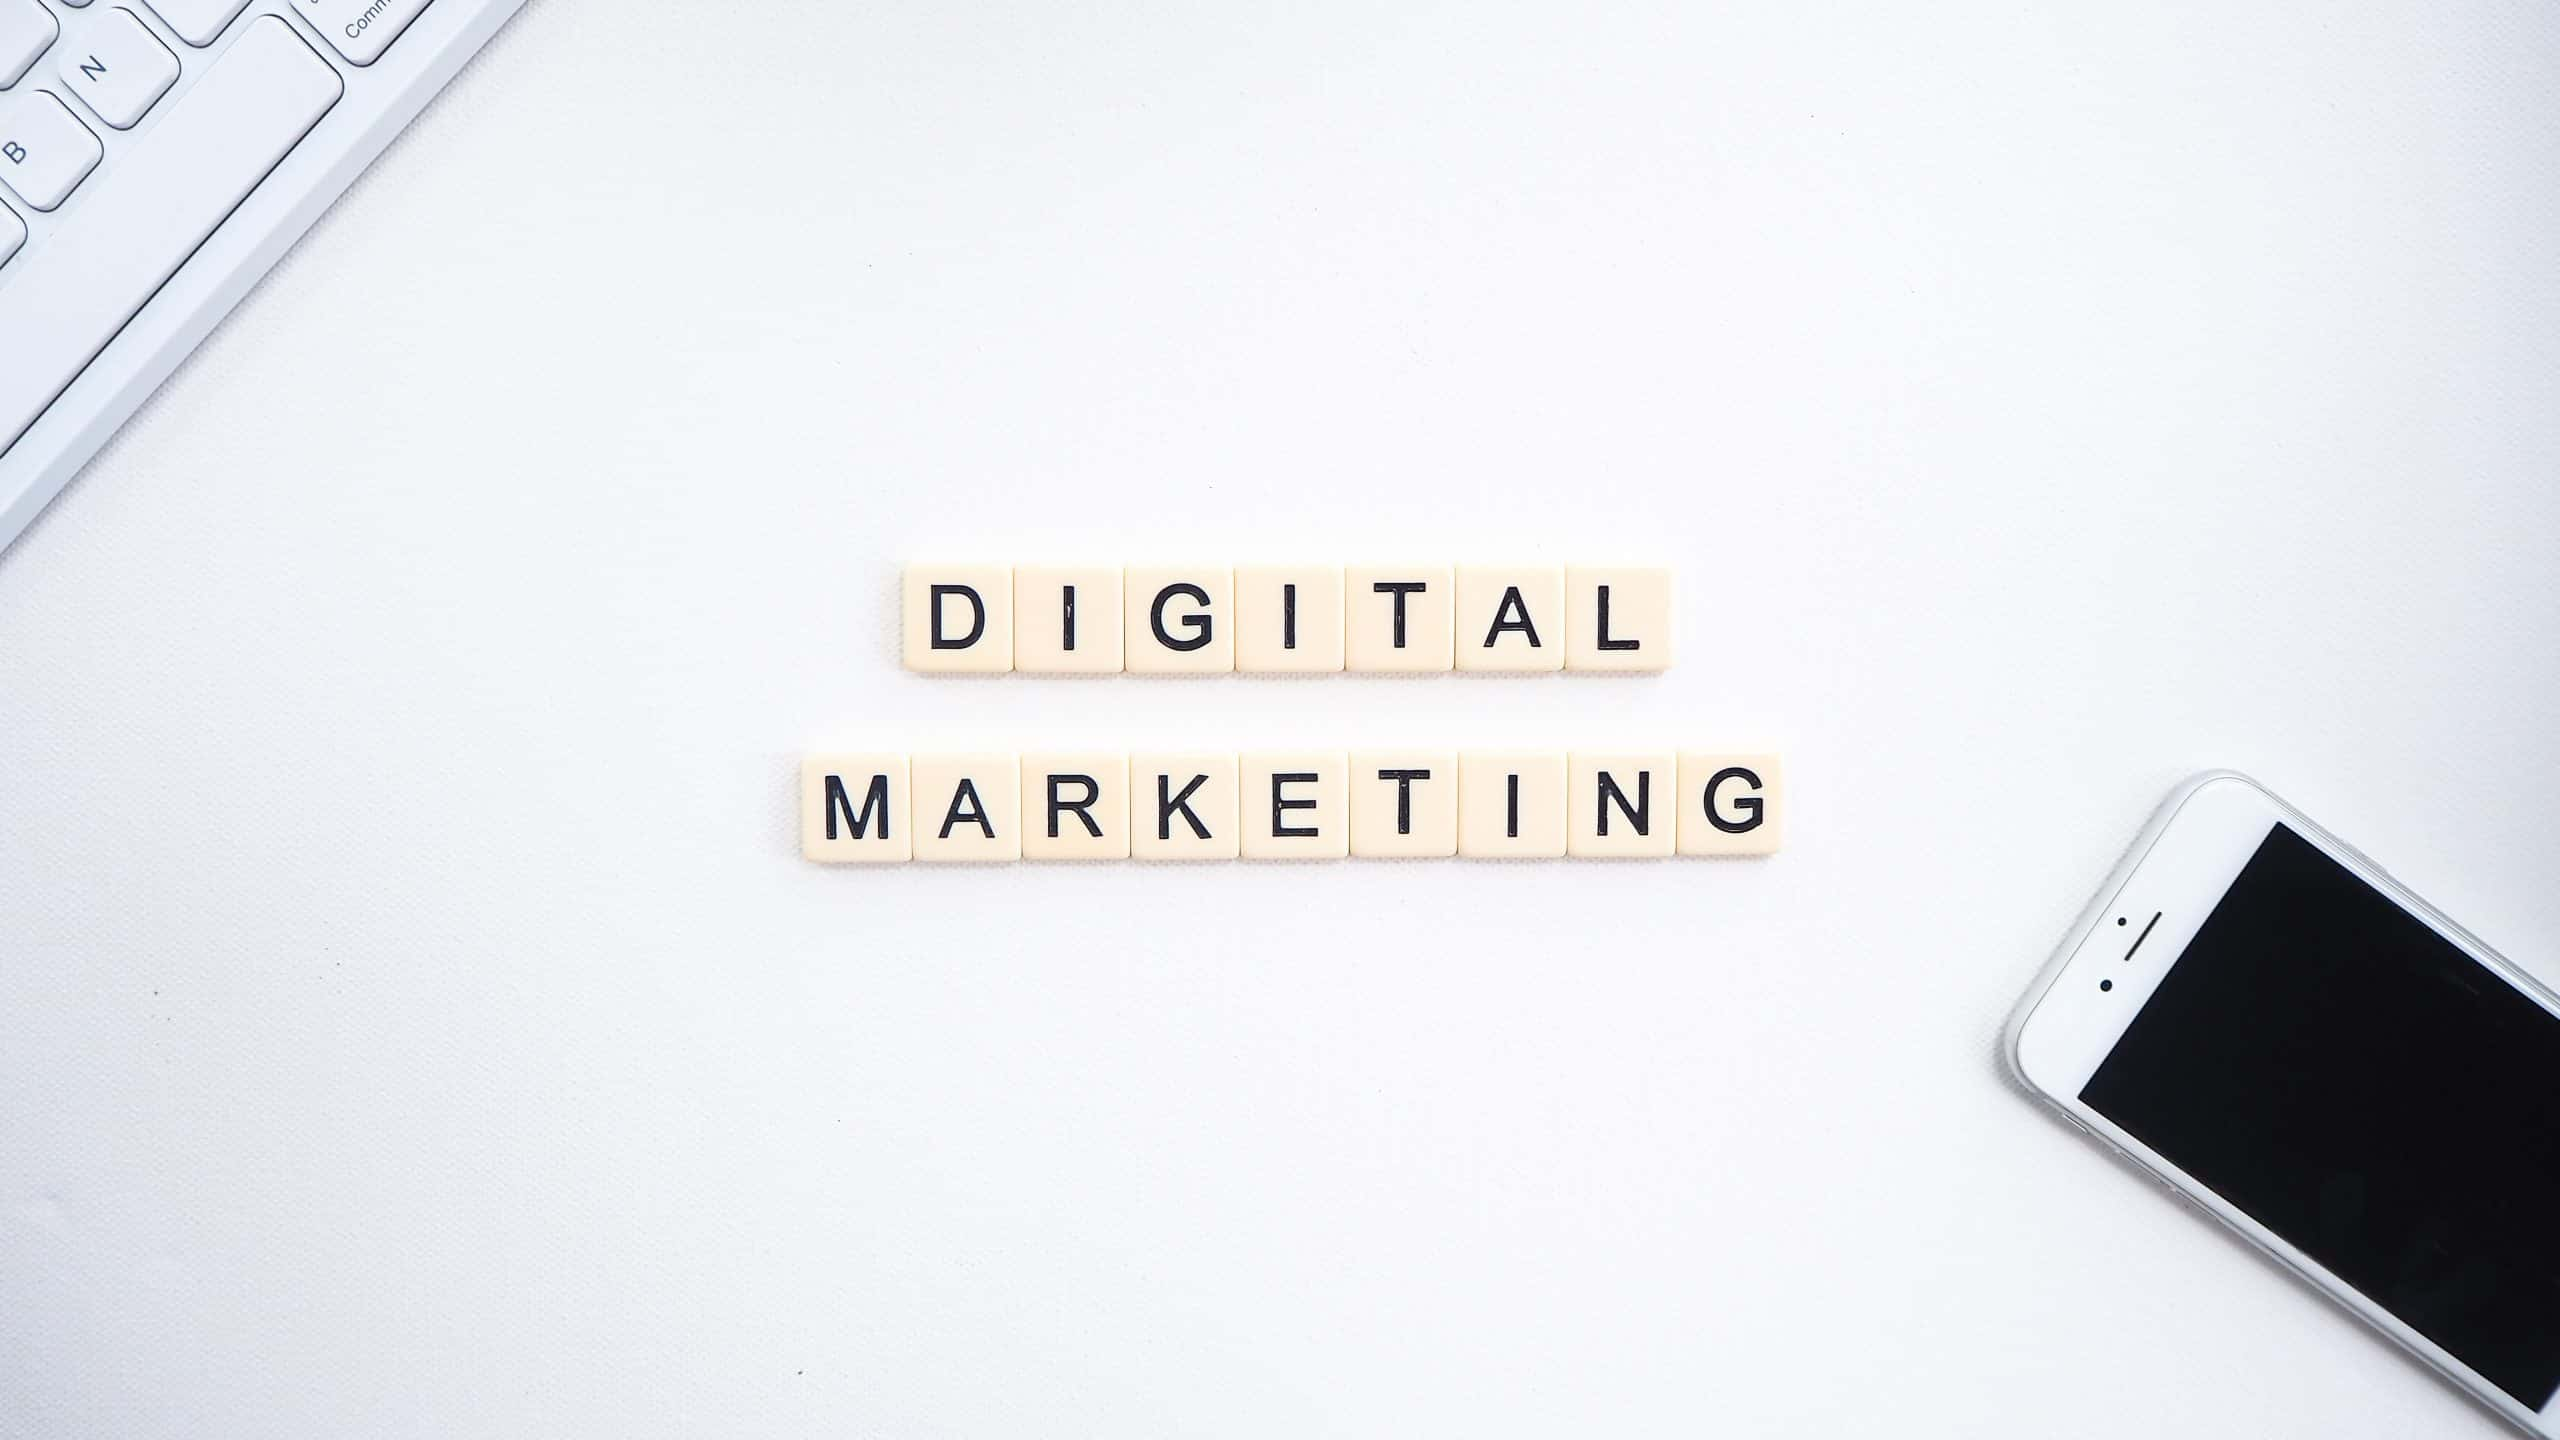 Digital Marketing Importance